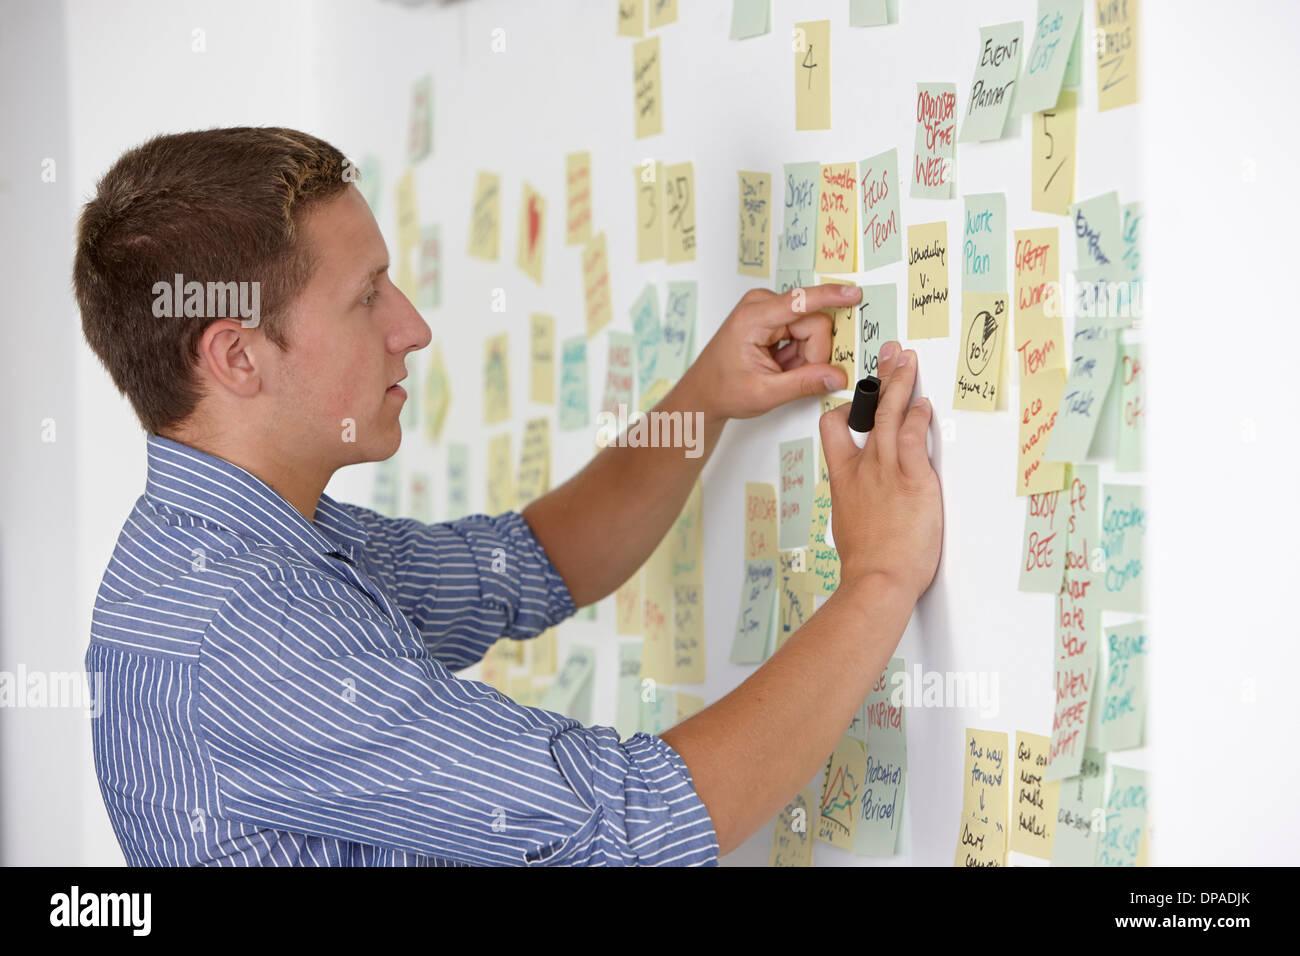 Joven nota adhesiva pegada en la pared Imagen De Stock